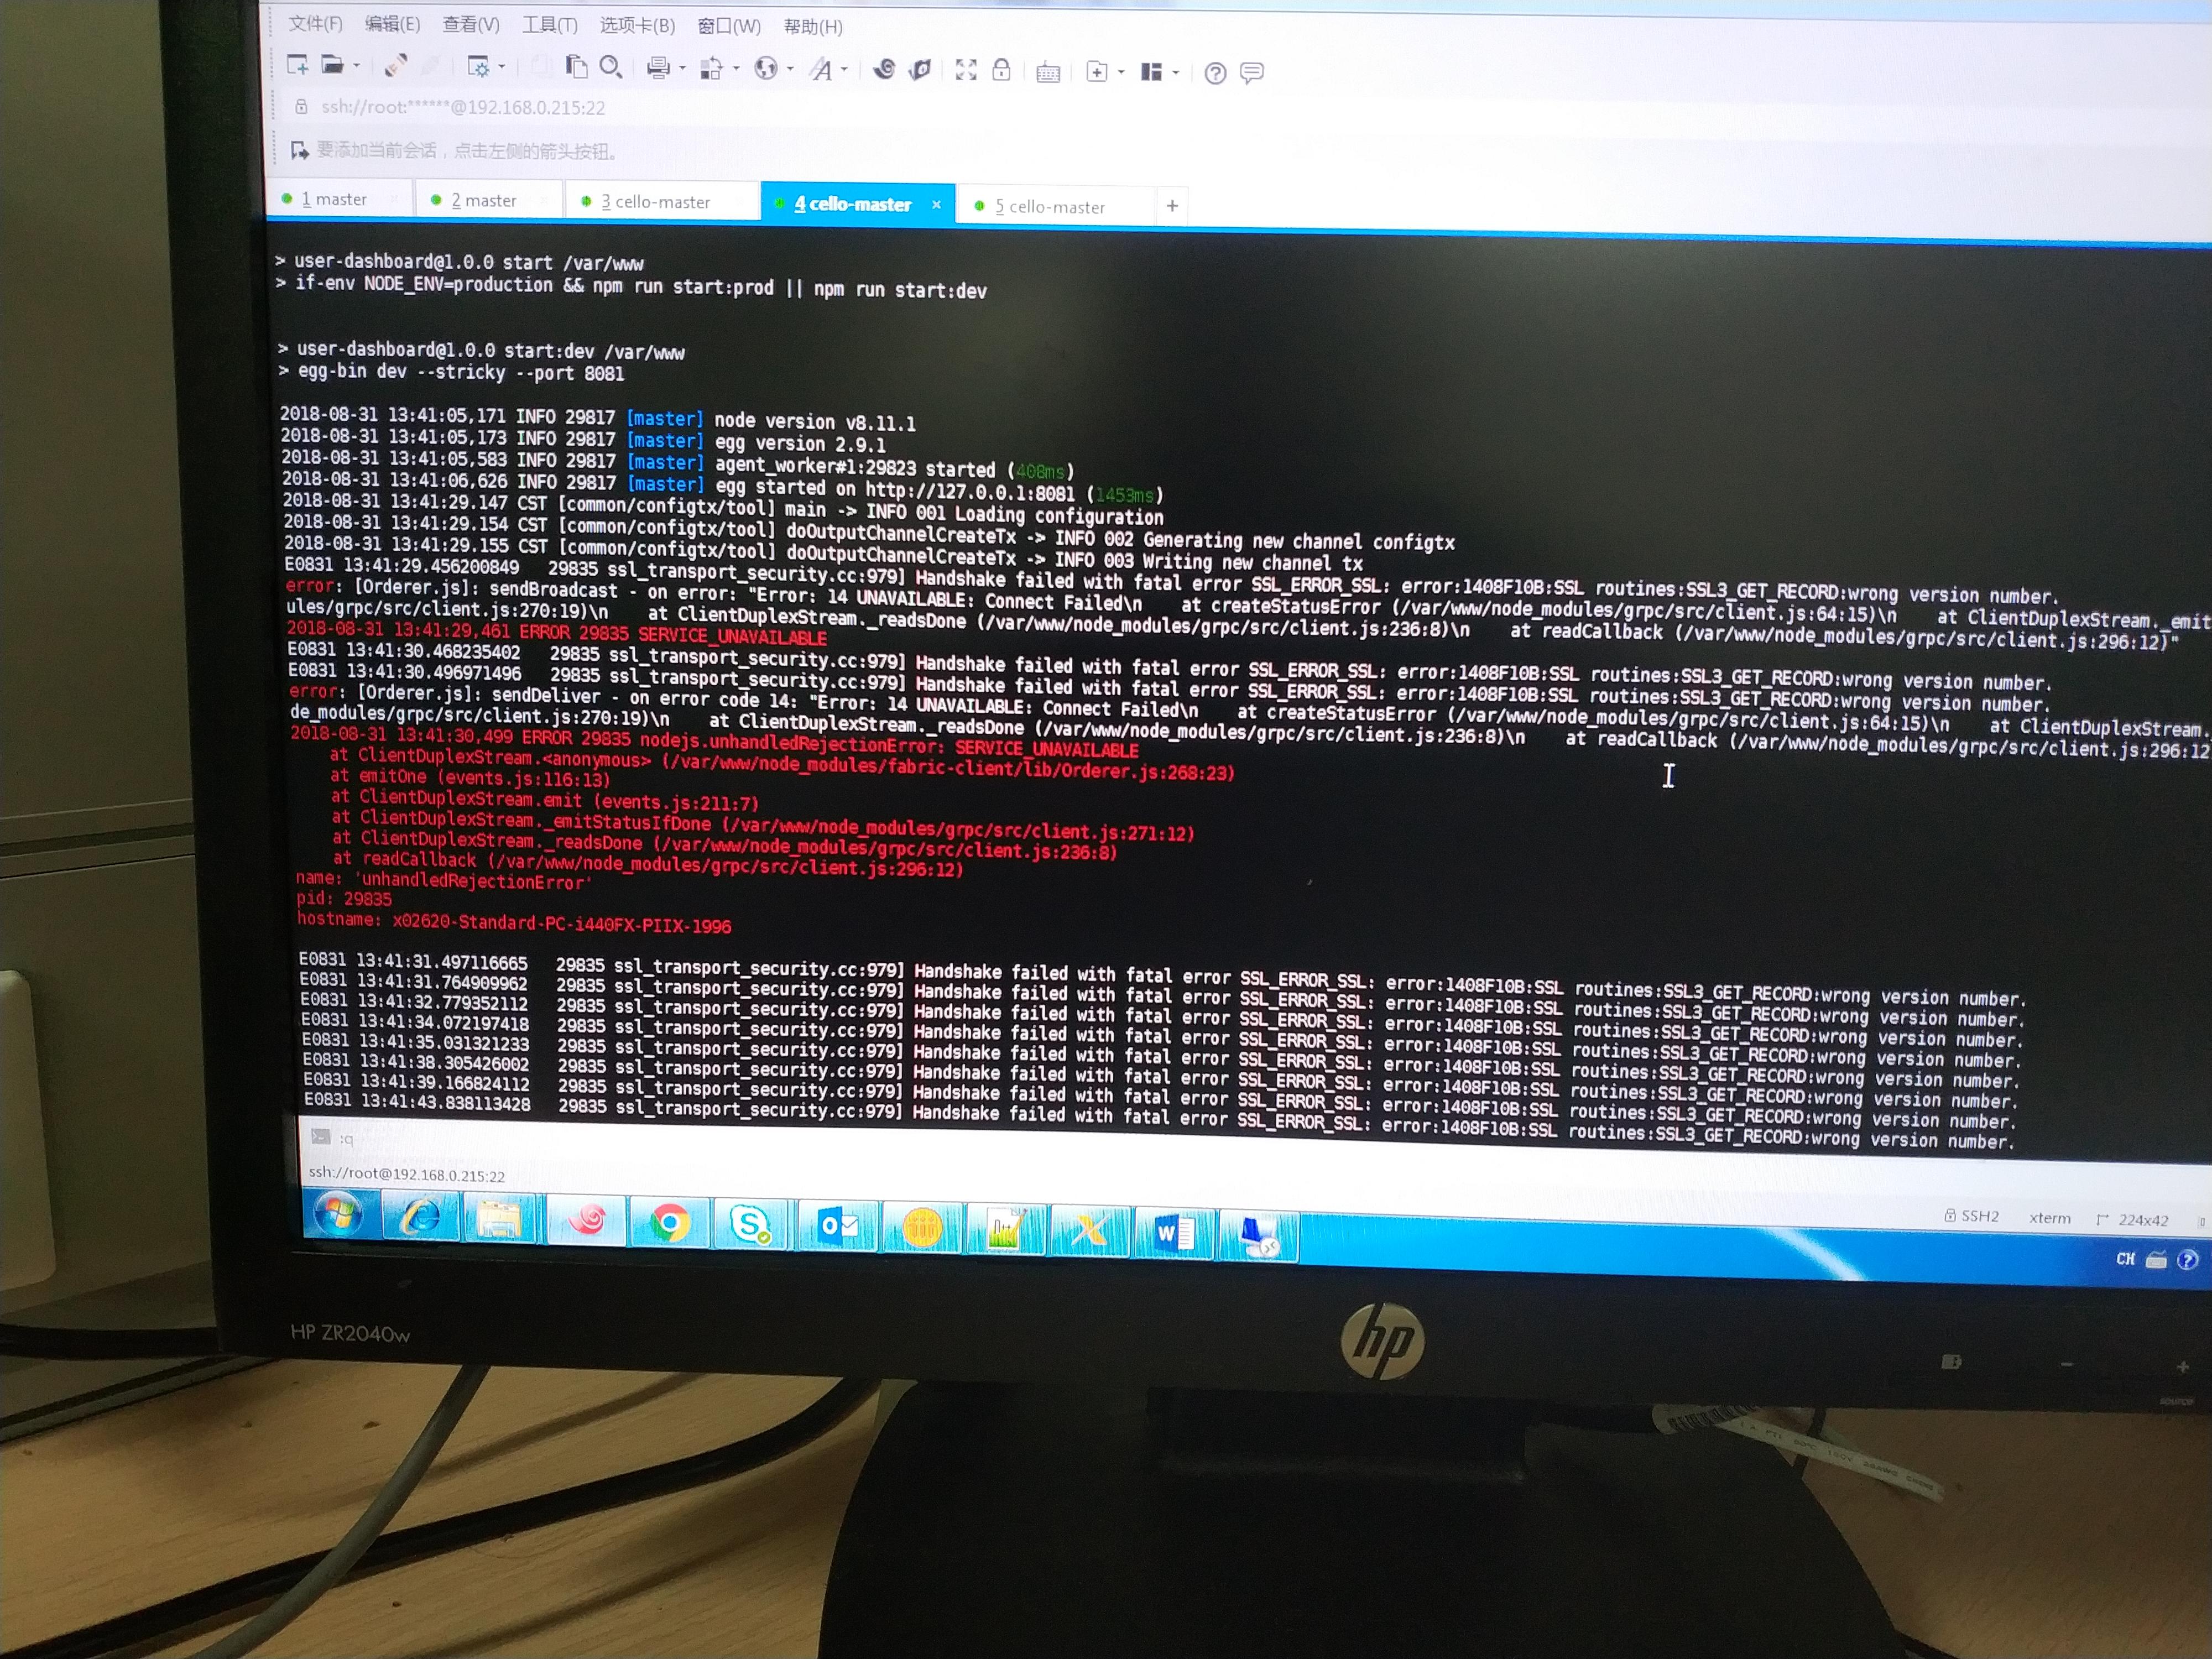 CE-453] When apply new chain in the dashboard,createTunnel